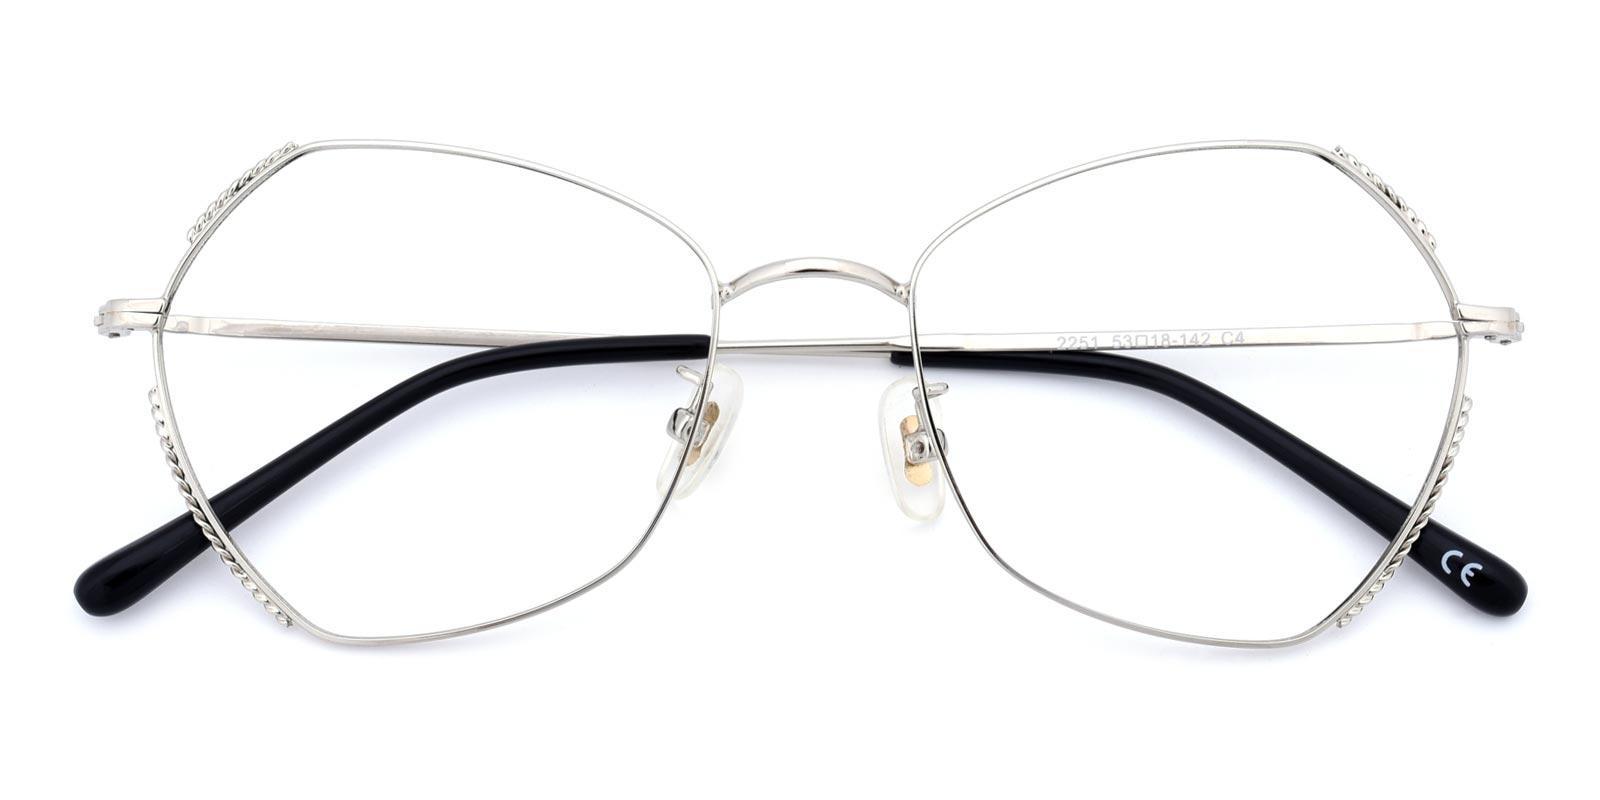 Spring-Silver-Geometric-Metal-Eyeglasses-detail